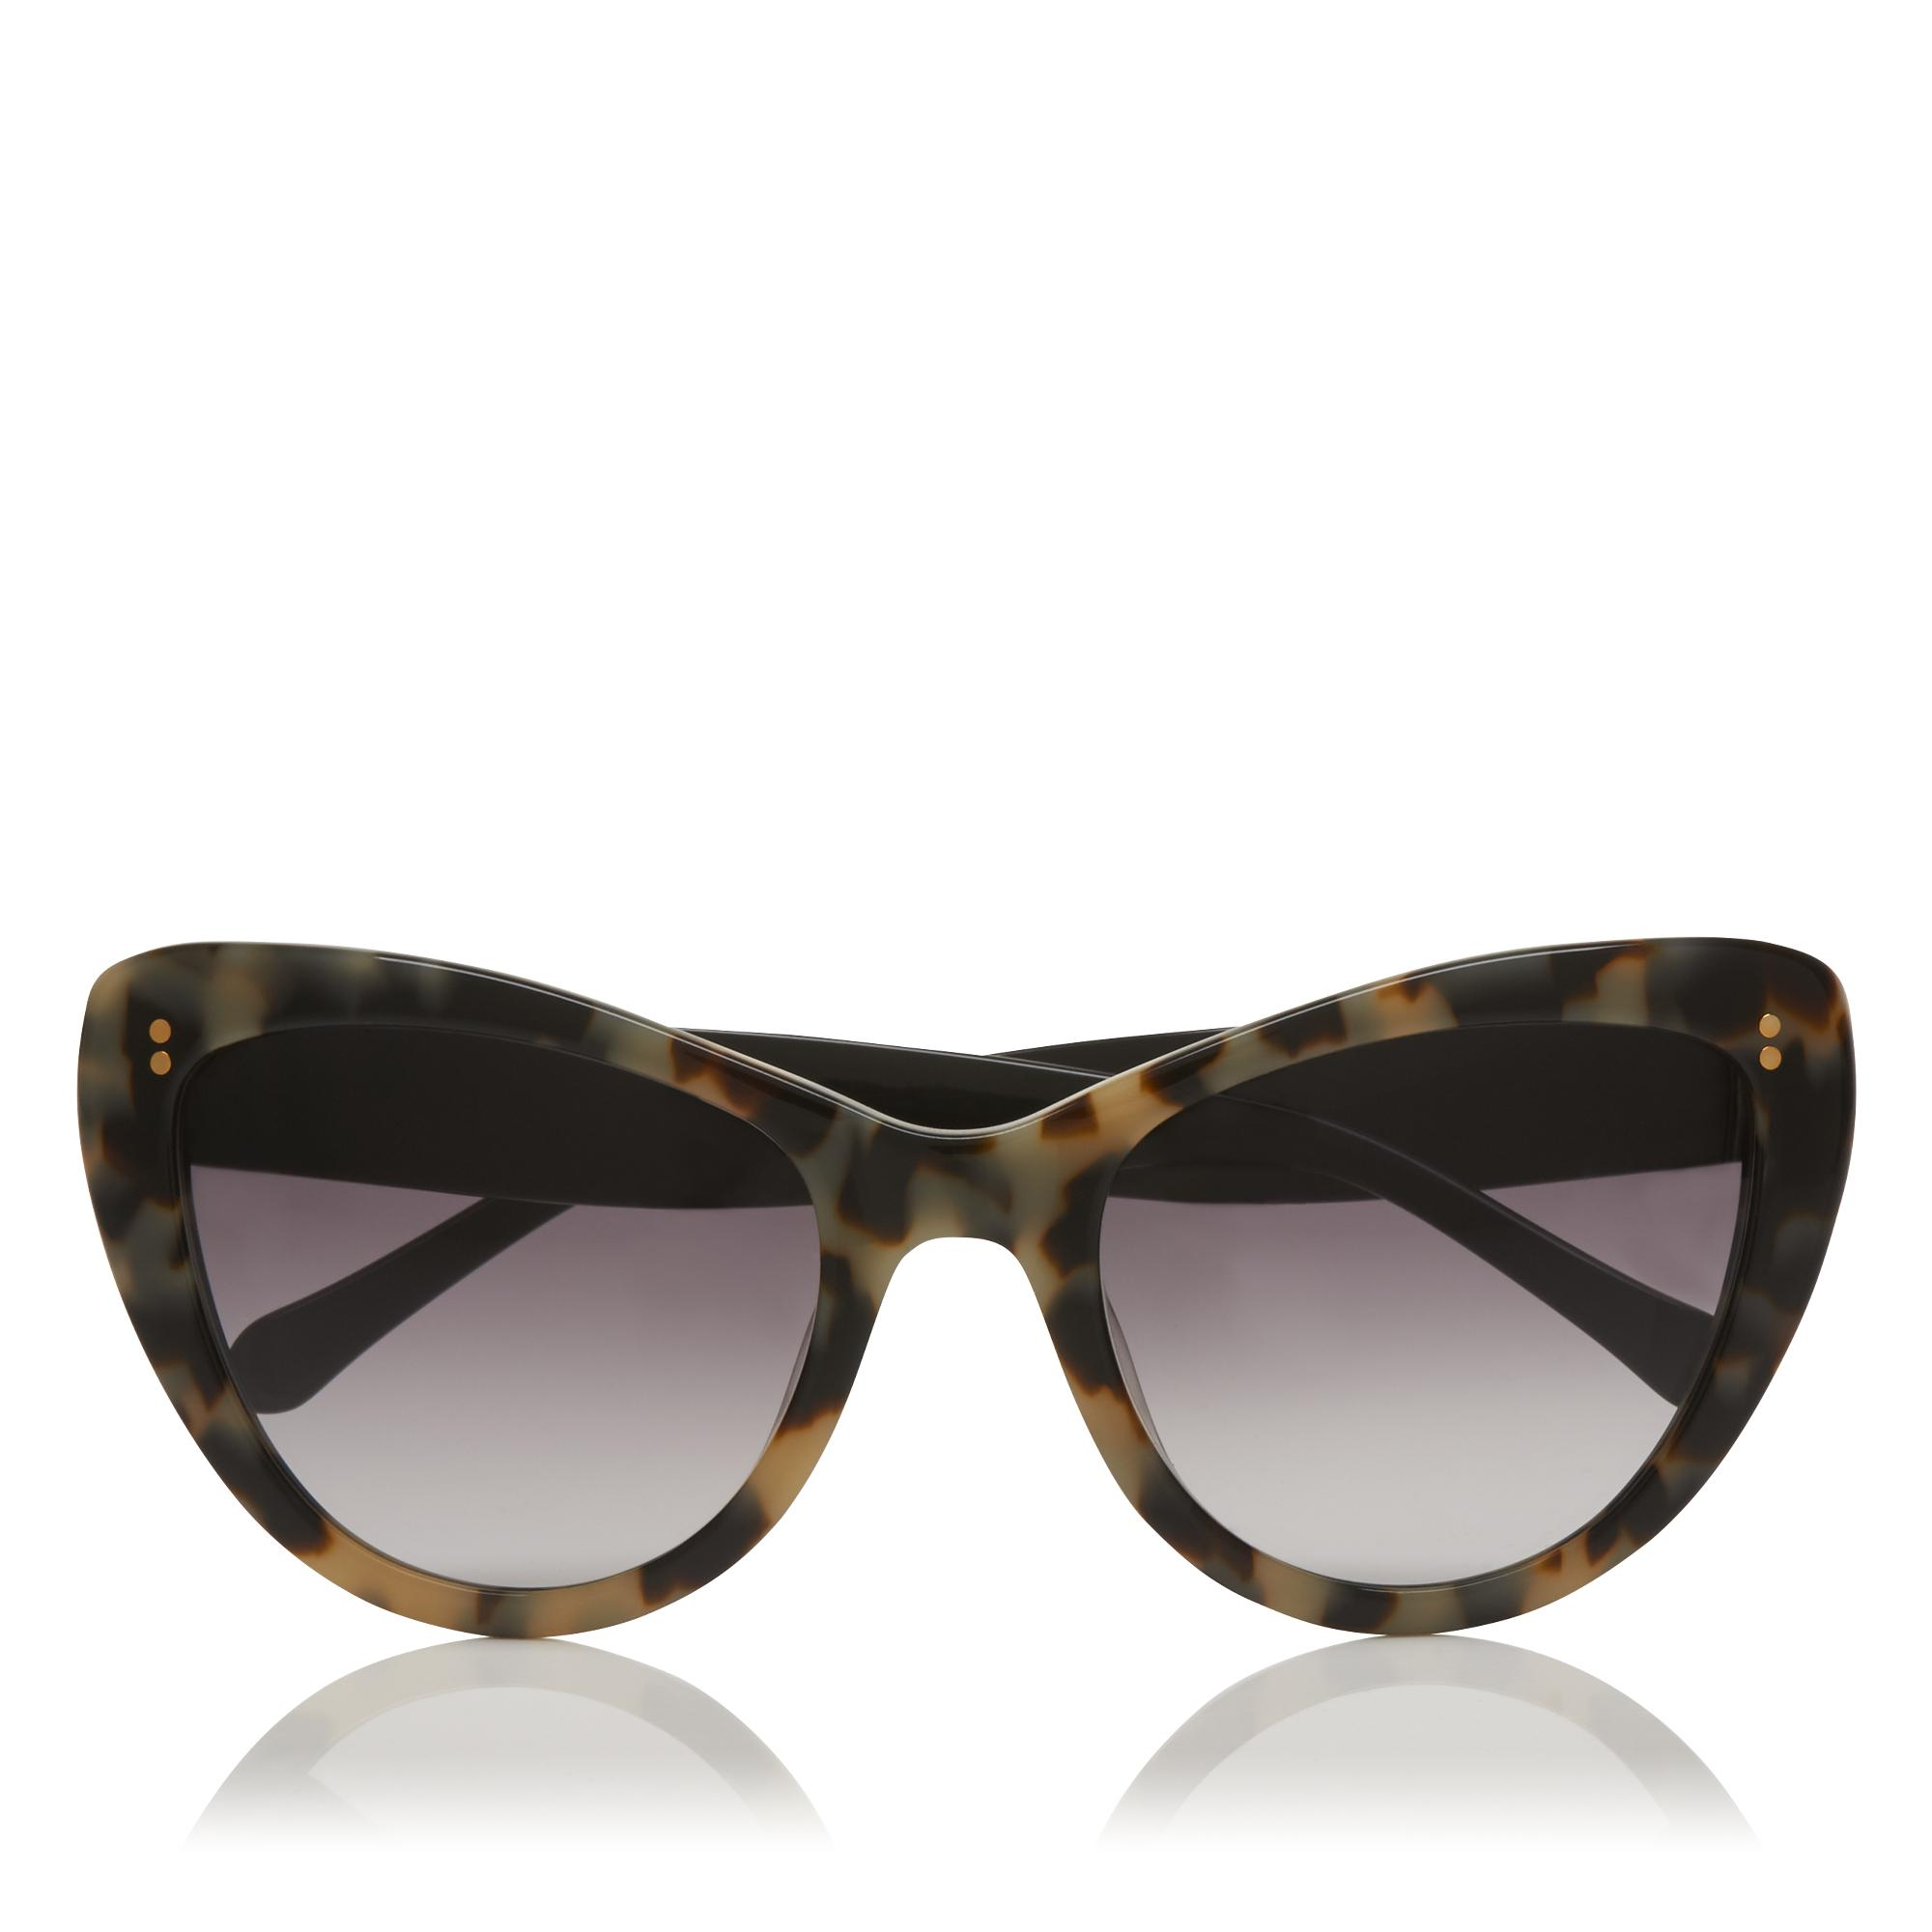 Alex Taupe Tortoiseshell Sunglasses